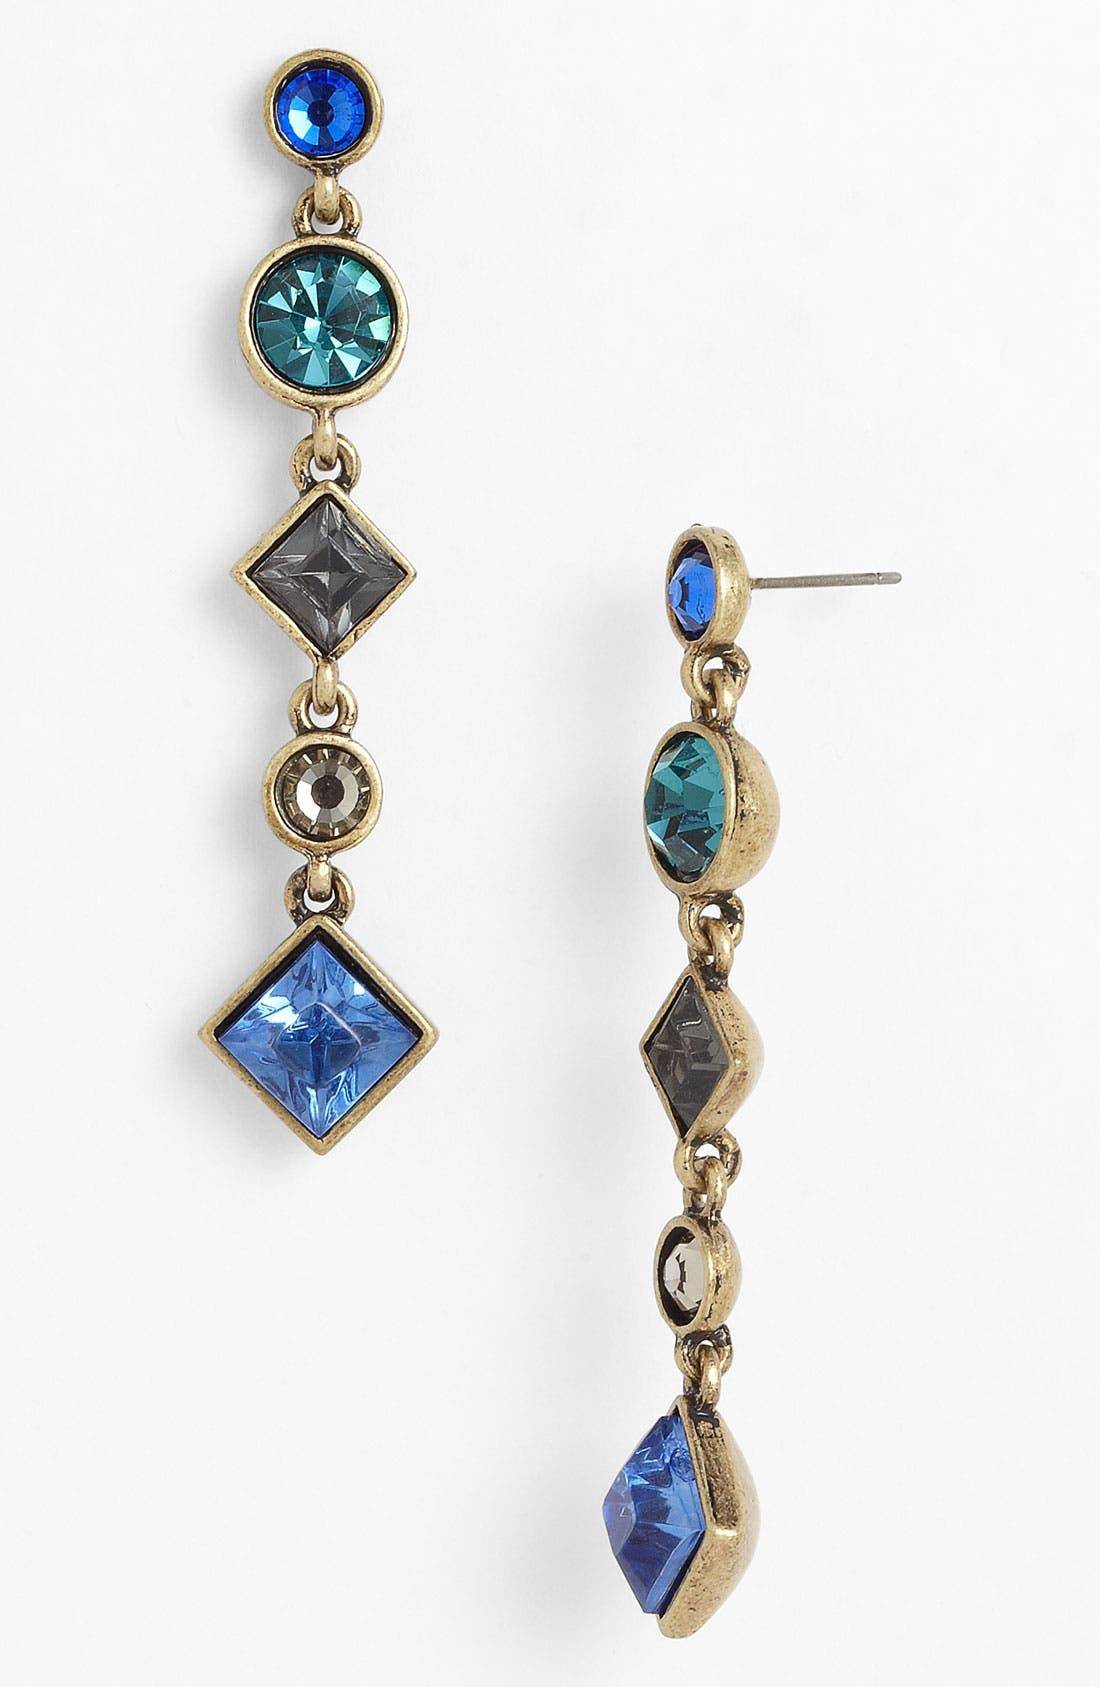 Alternate Image 1 Selected - Nordstrom 'Old Hollywood' Linear Earrings